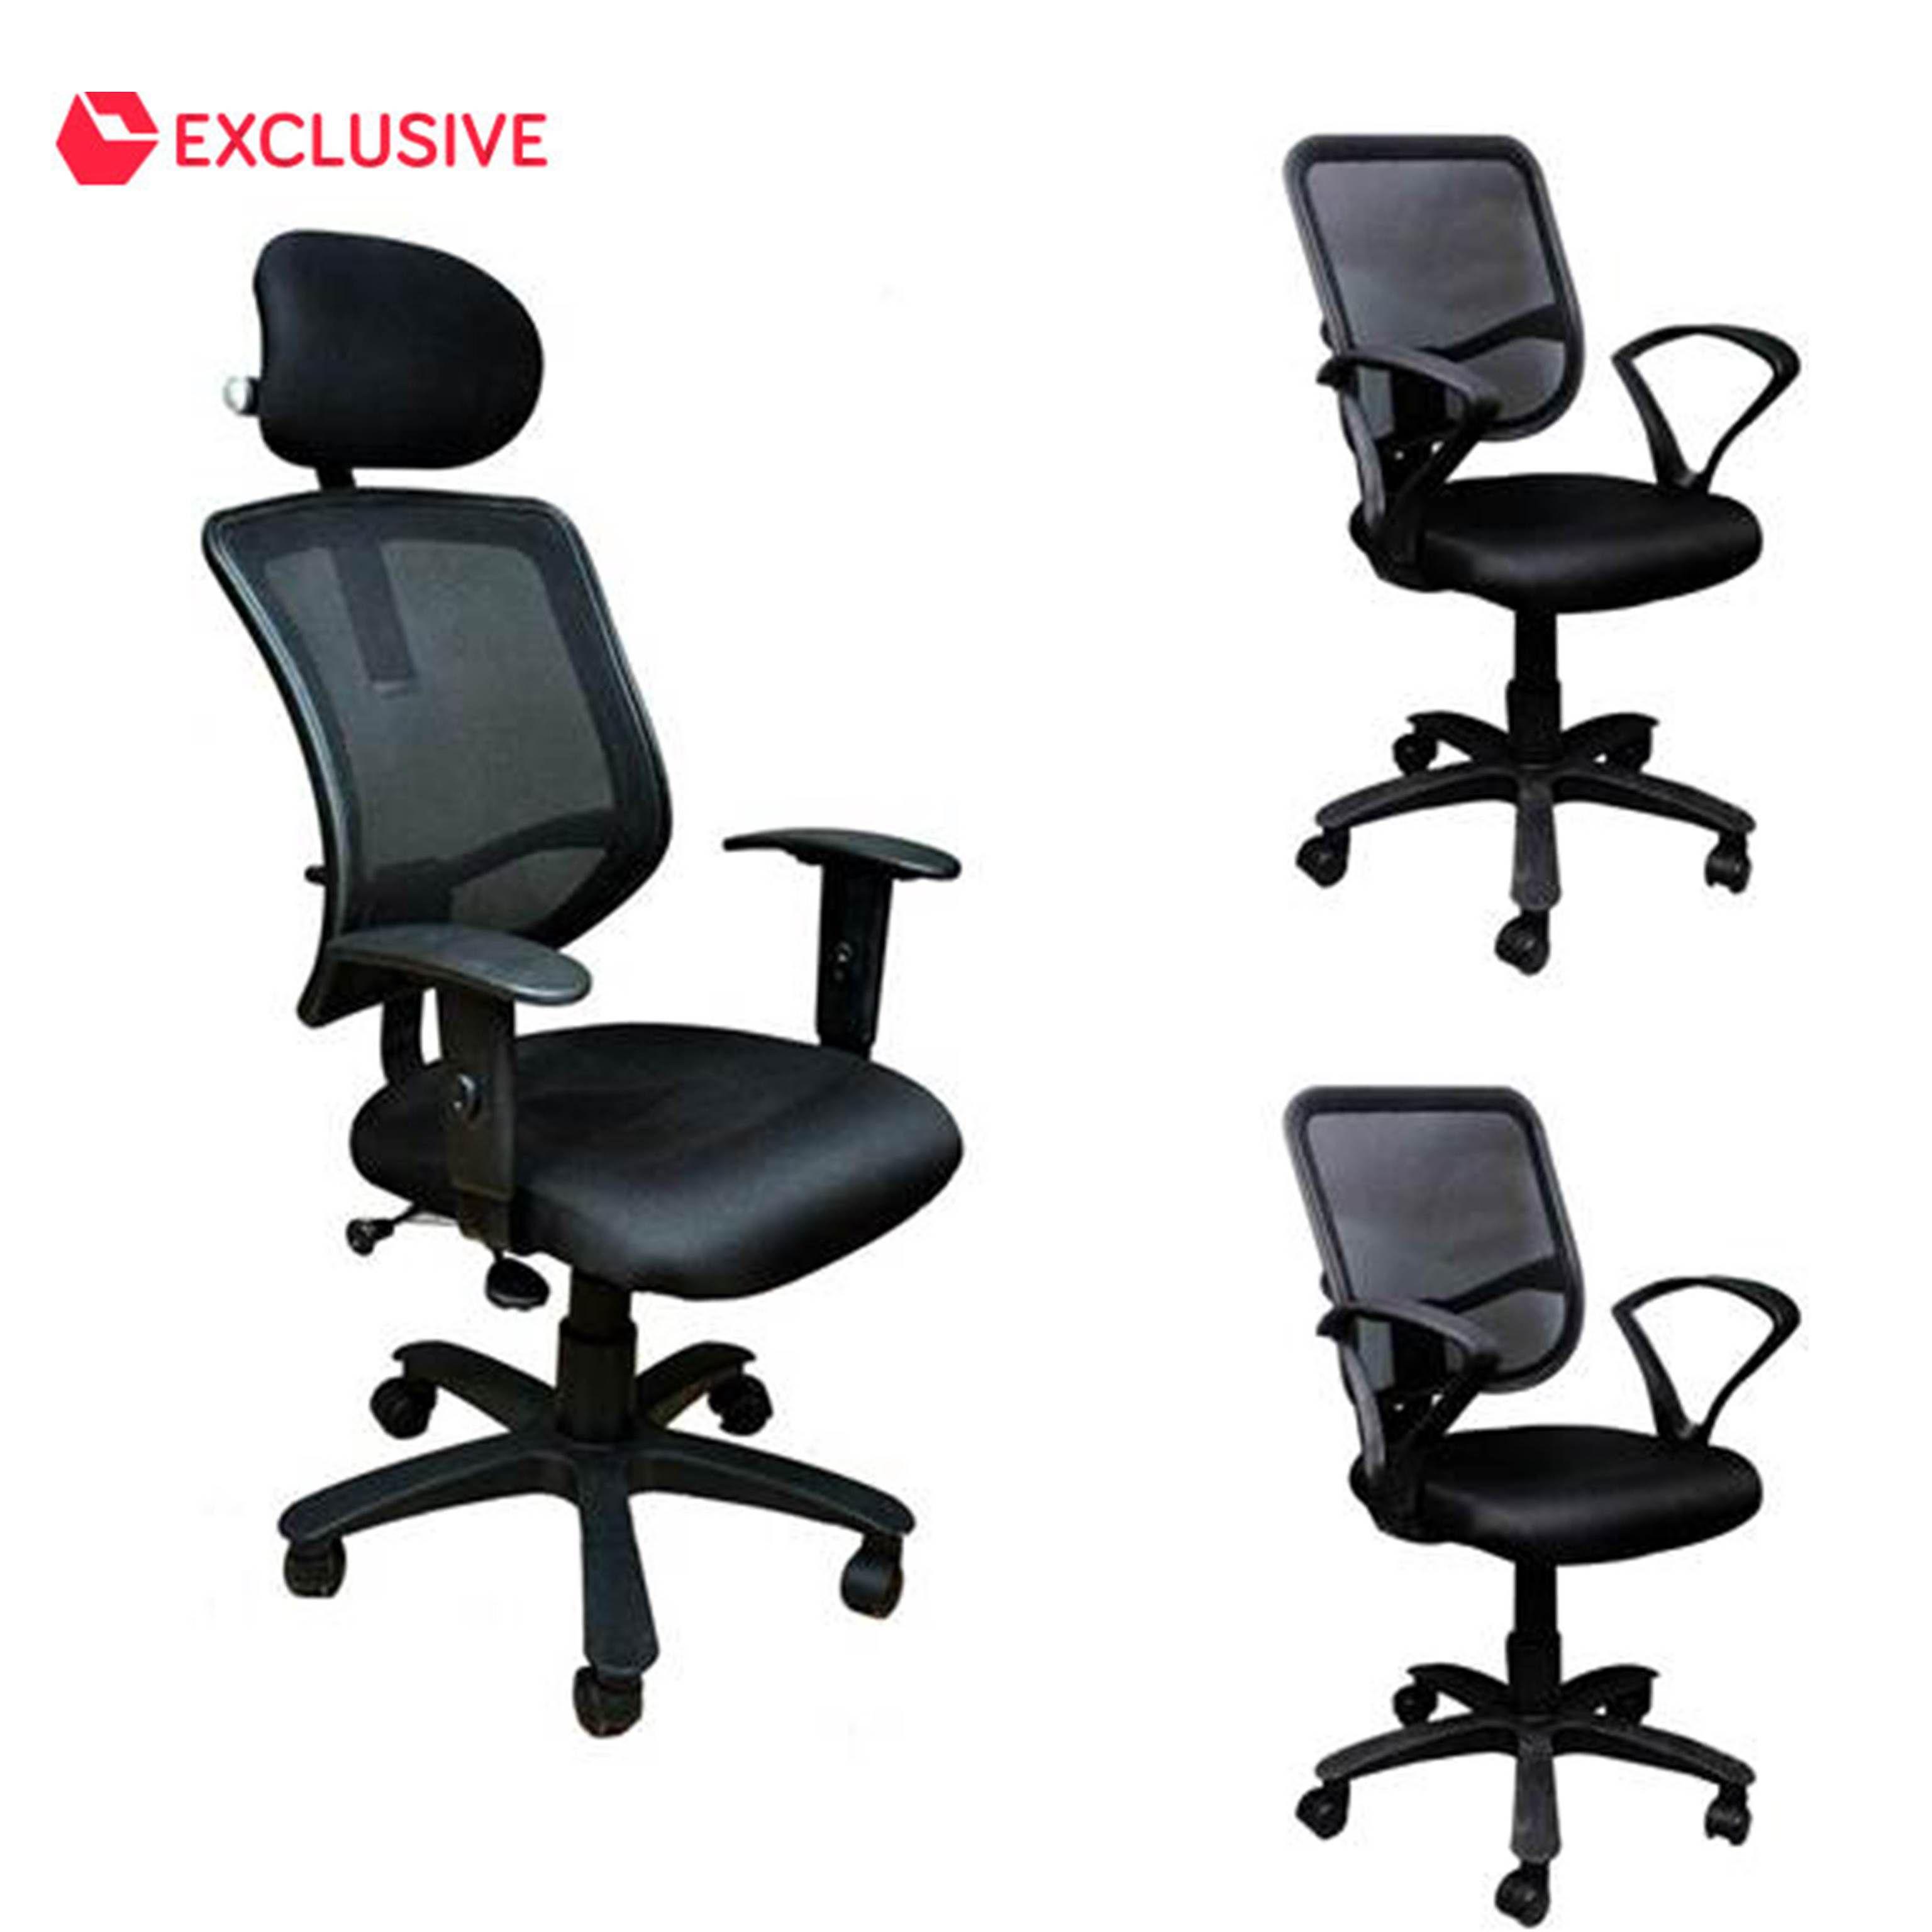 KV Industries Trax fice Chair Set Buy KV Industries Trax